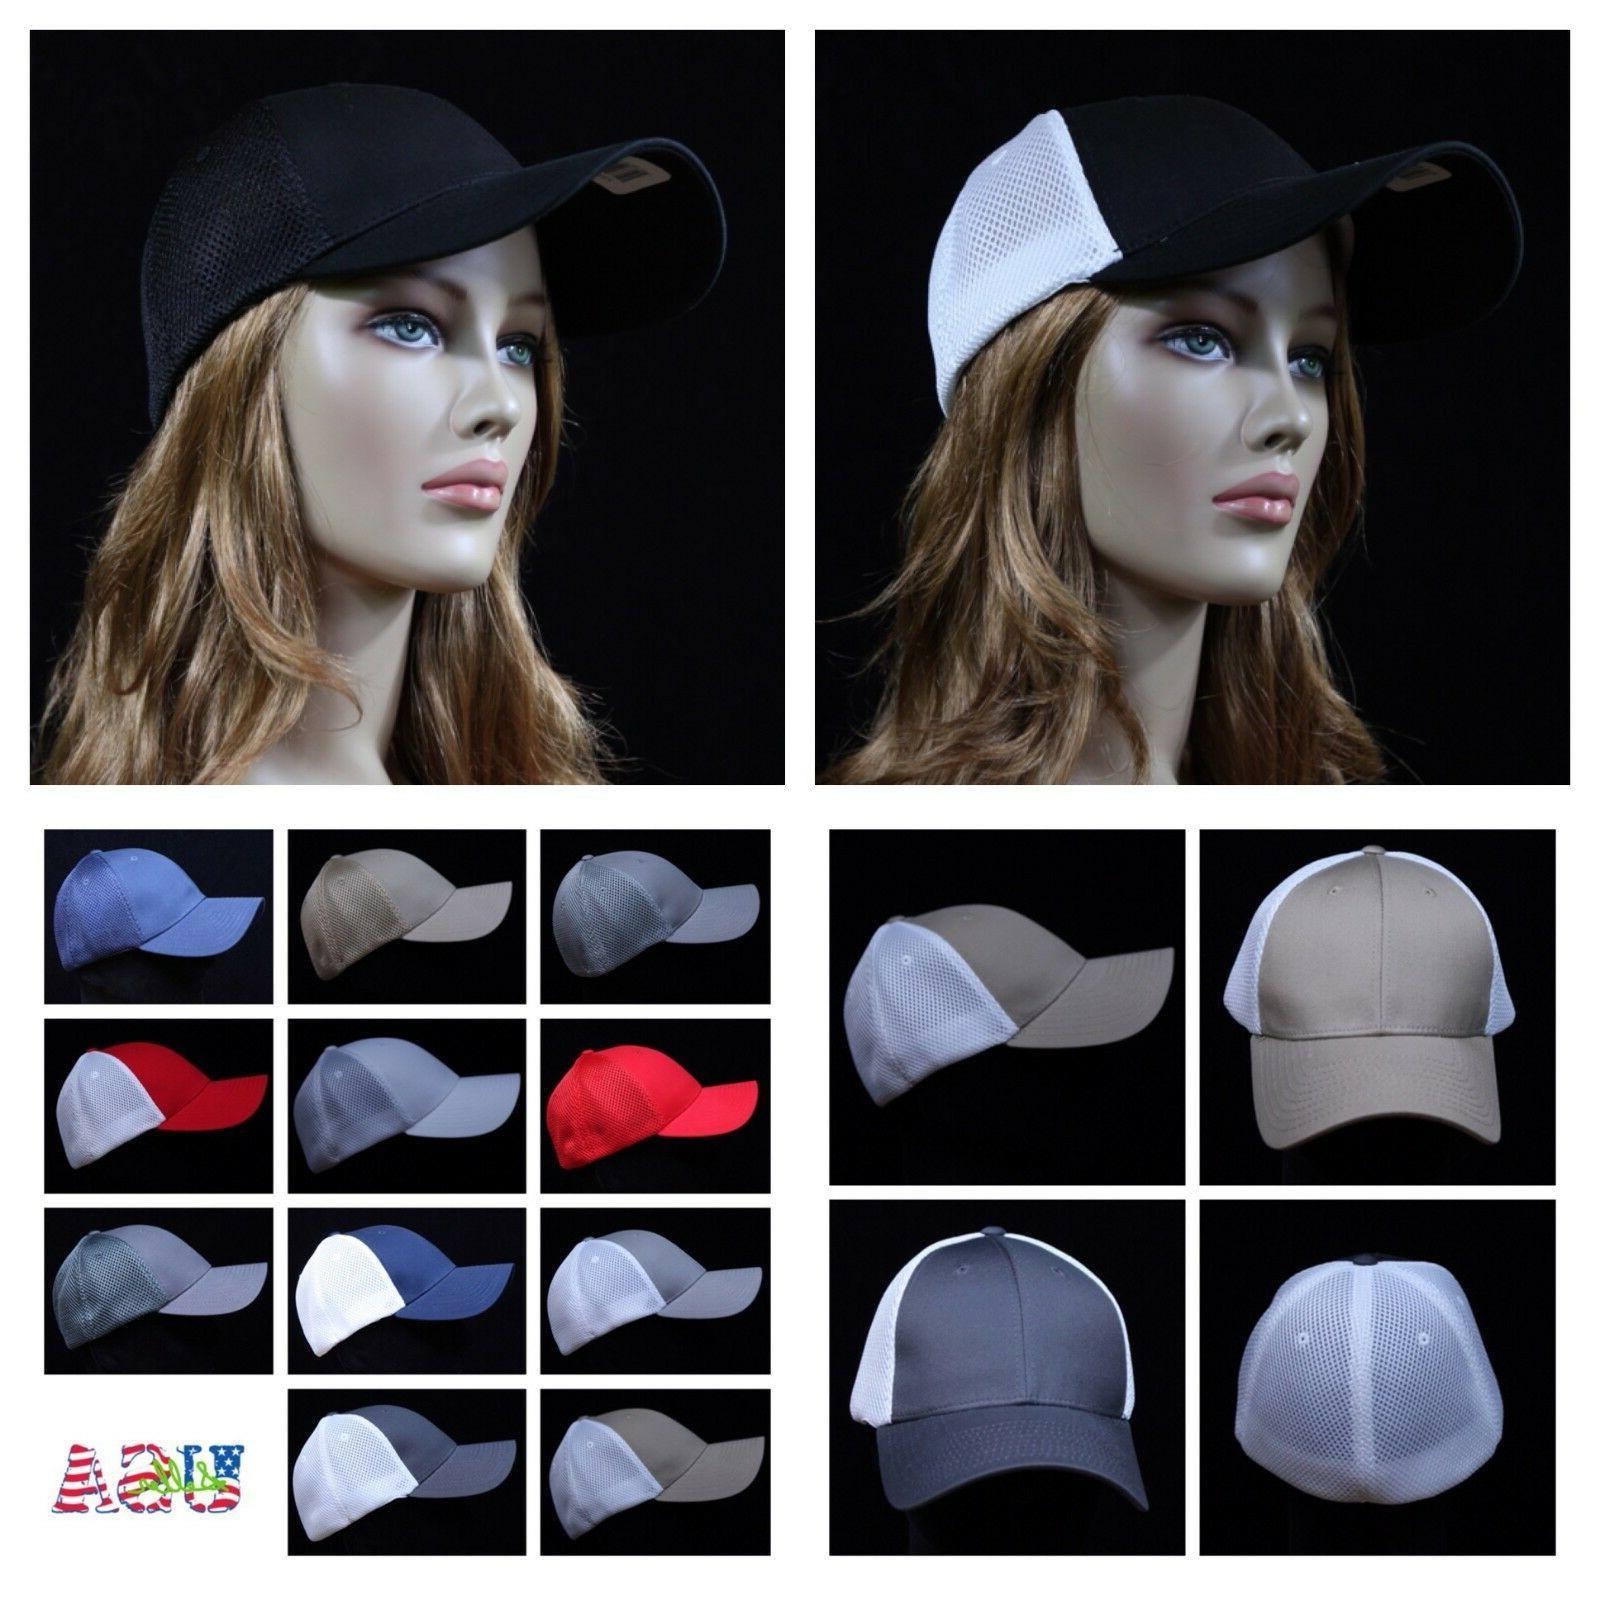 flex fit baseball cap mesh trucker hat